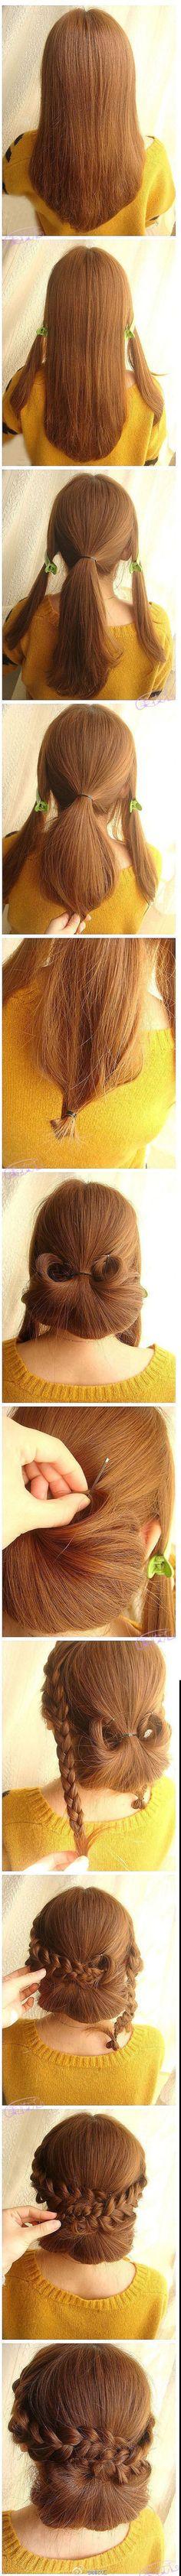 Simple to Make Hairstyles. . . Make Bun in Fun